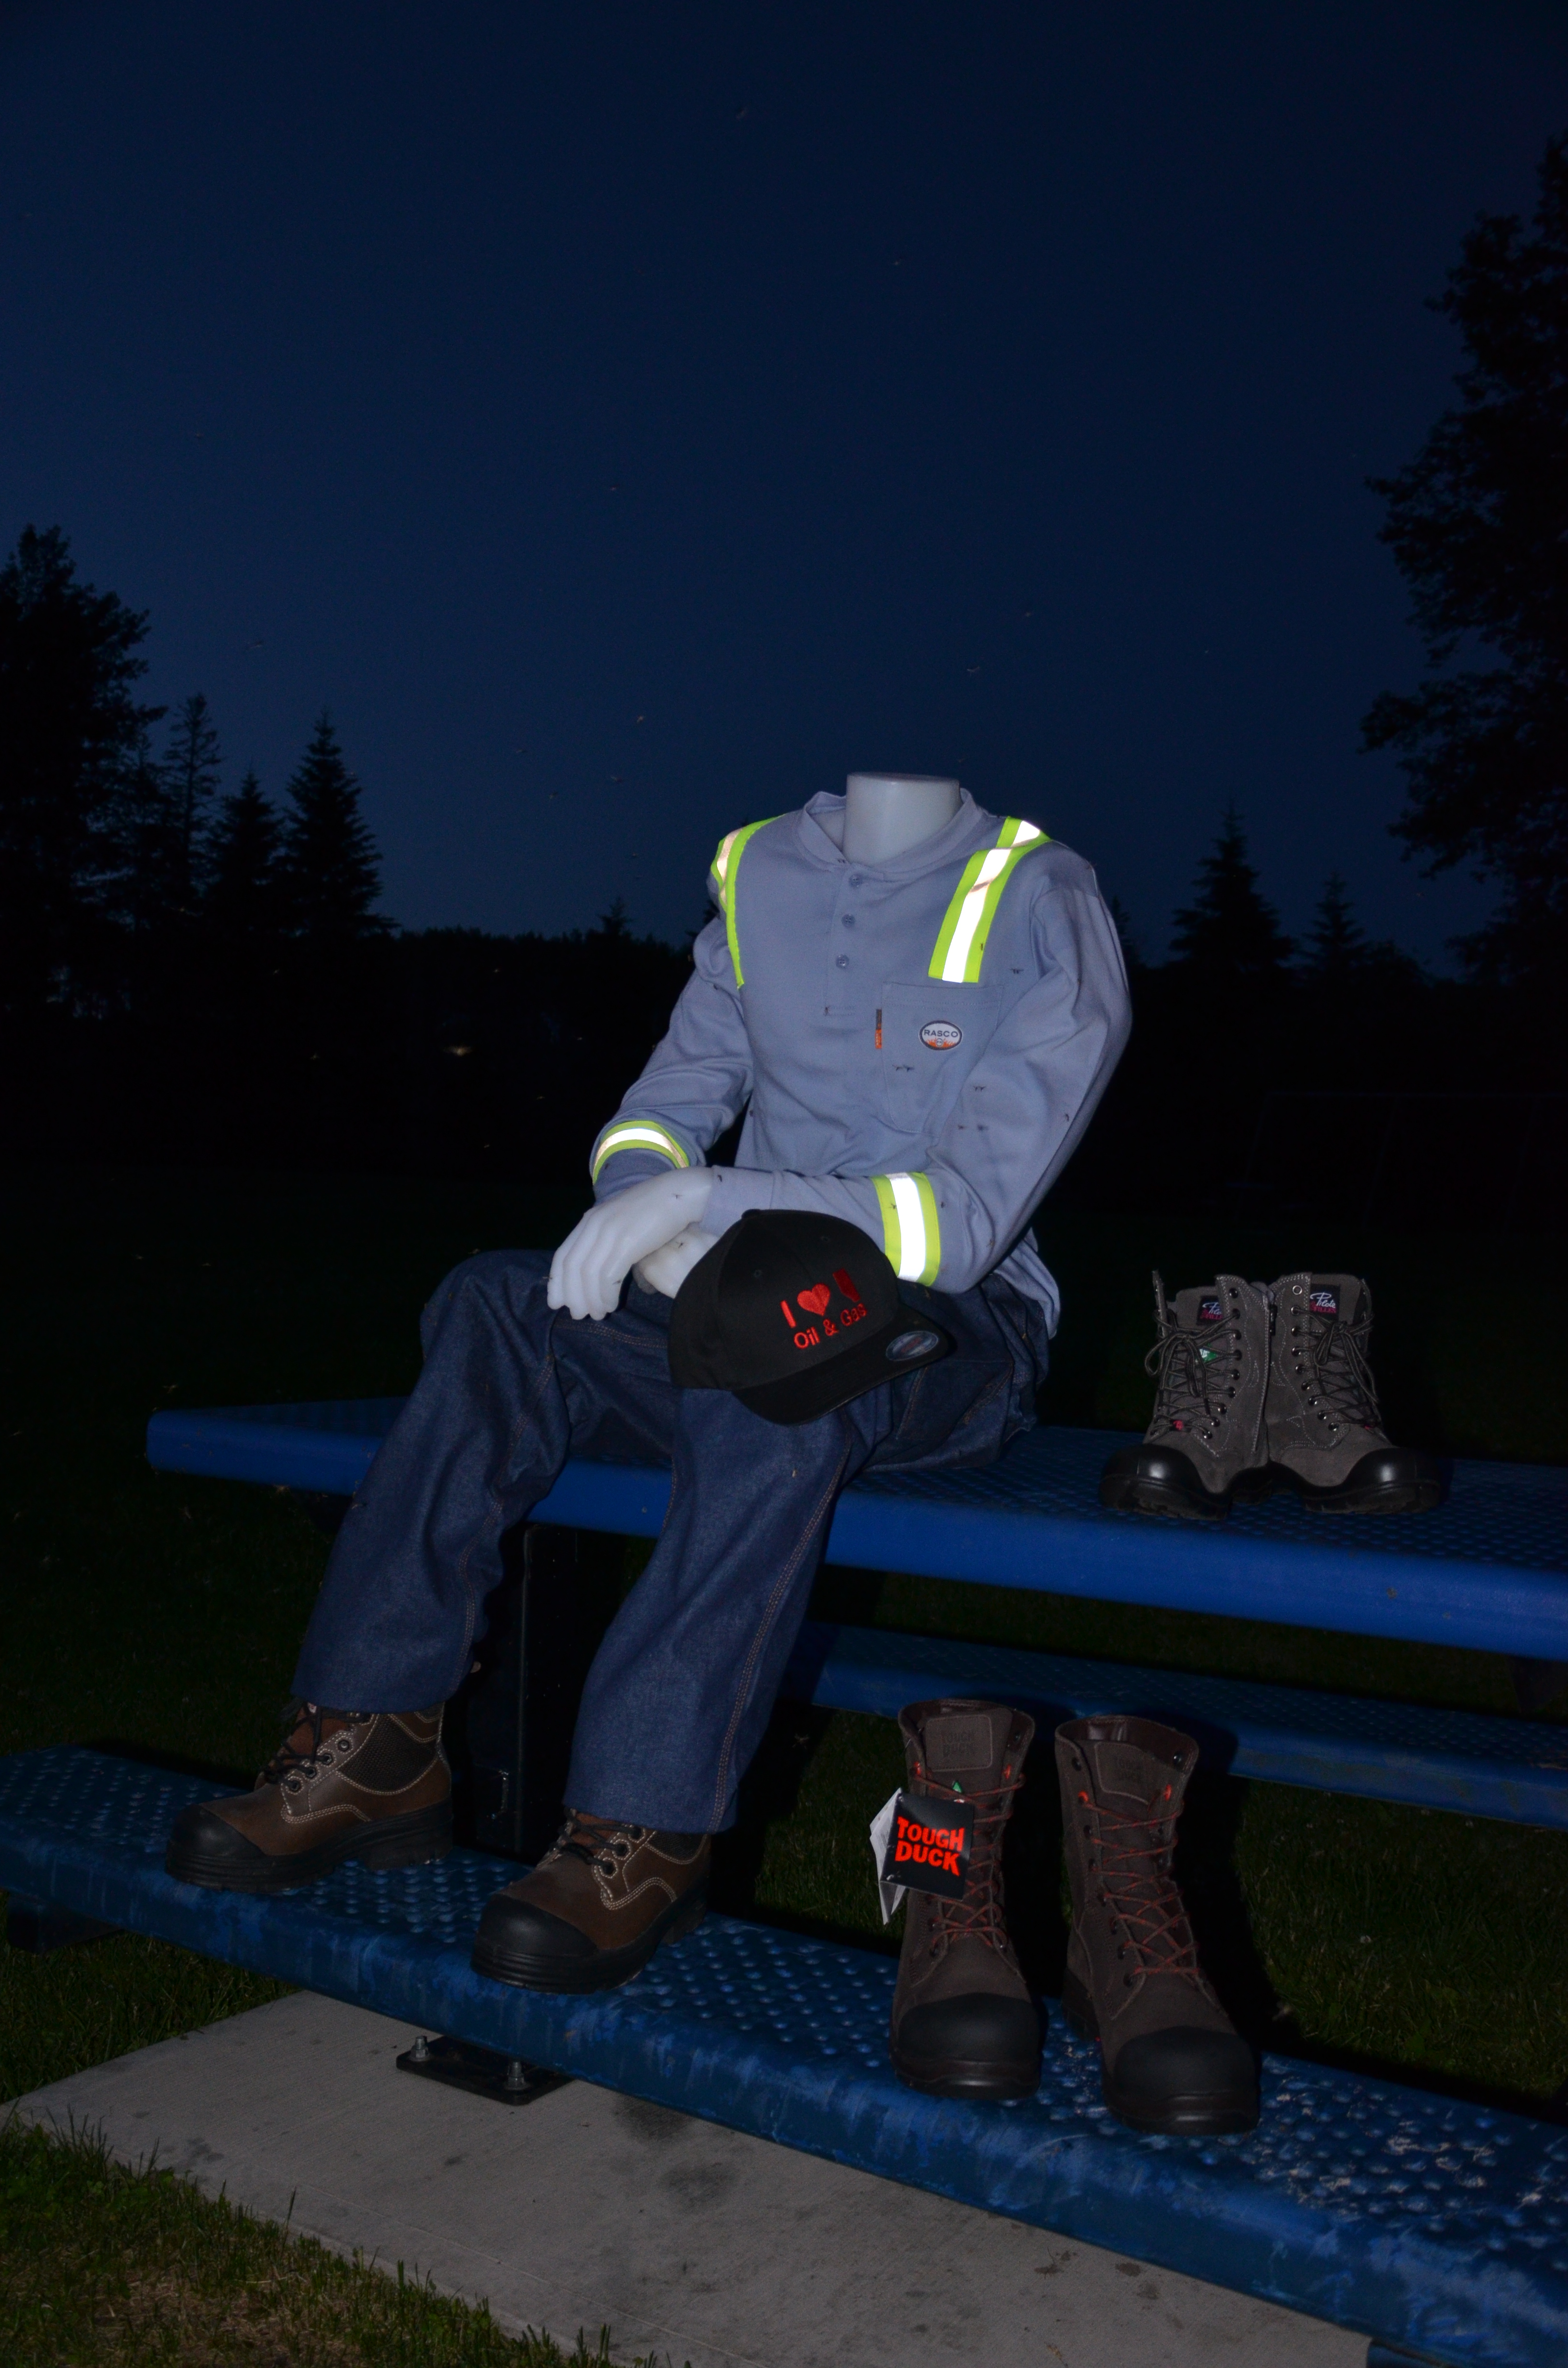 Direct Workwear Mannequin wearing safety gear